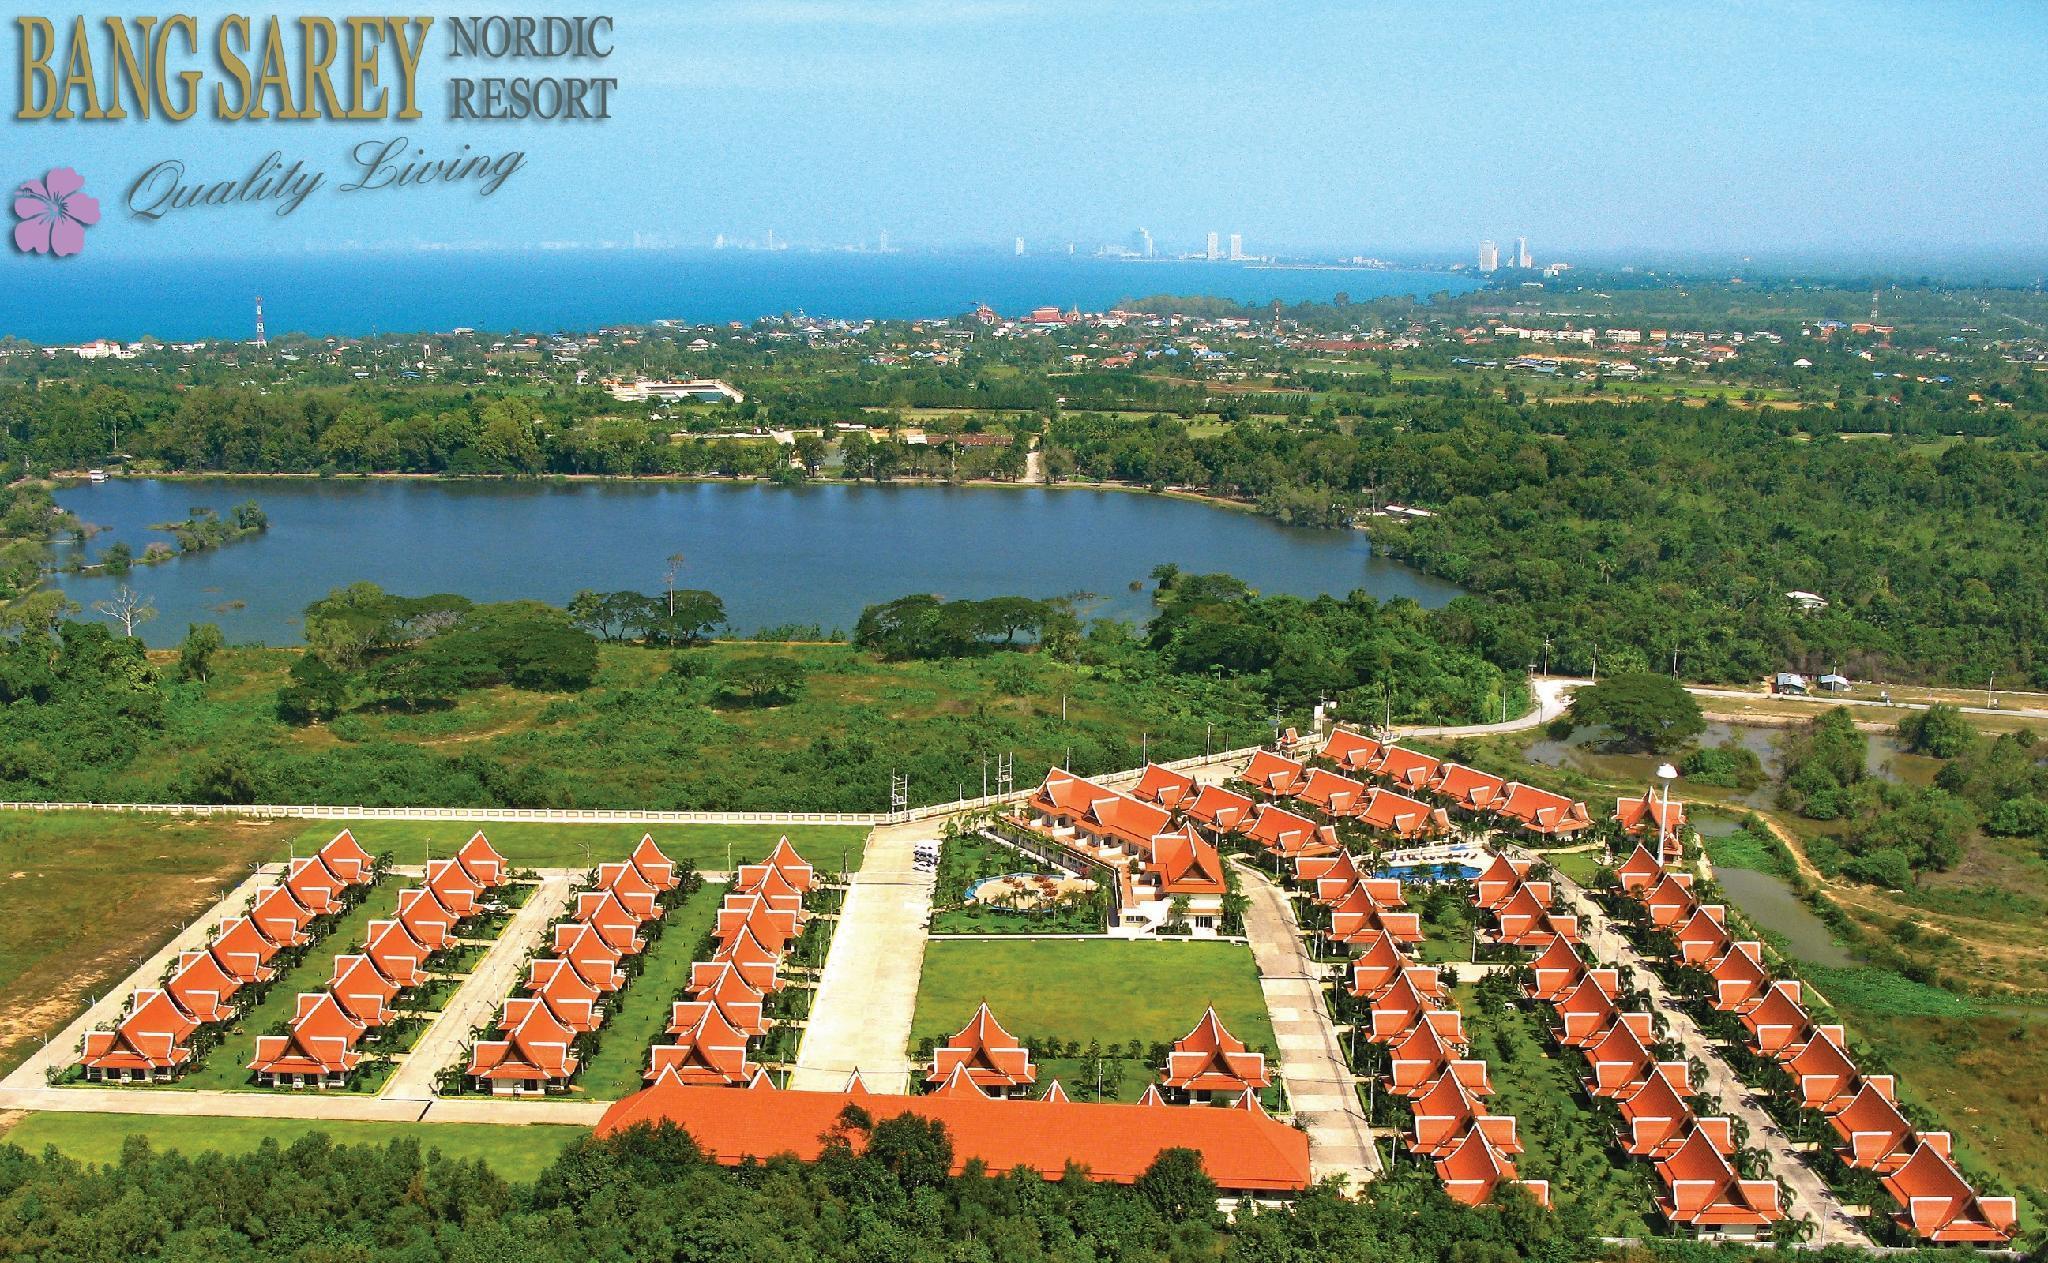 Bang Sarey Nordic Resort Reviews